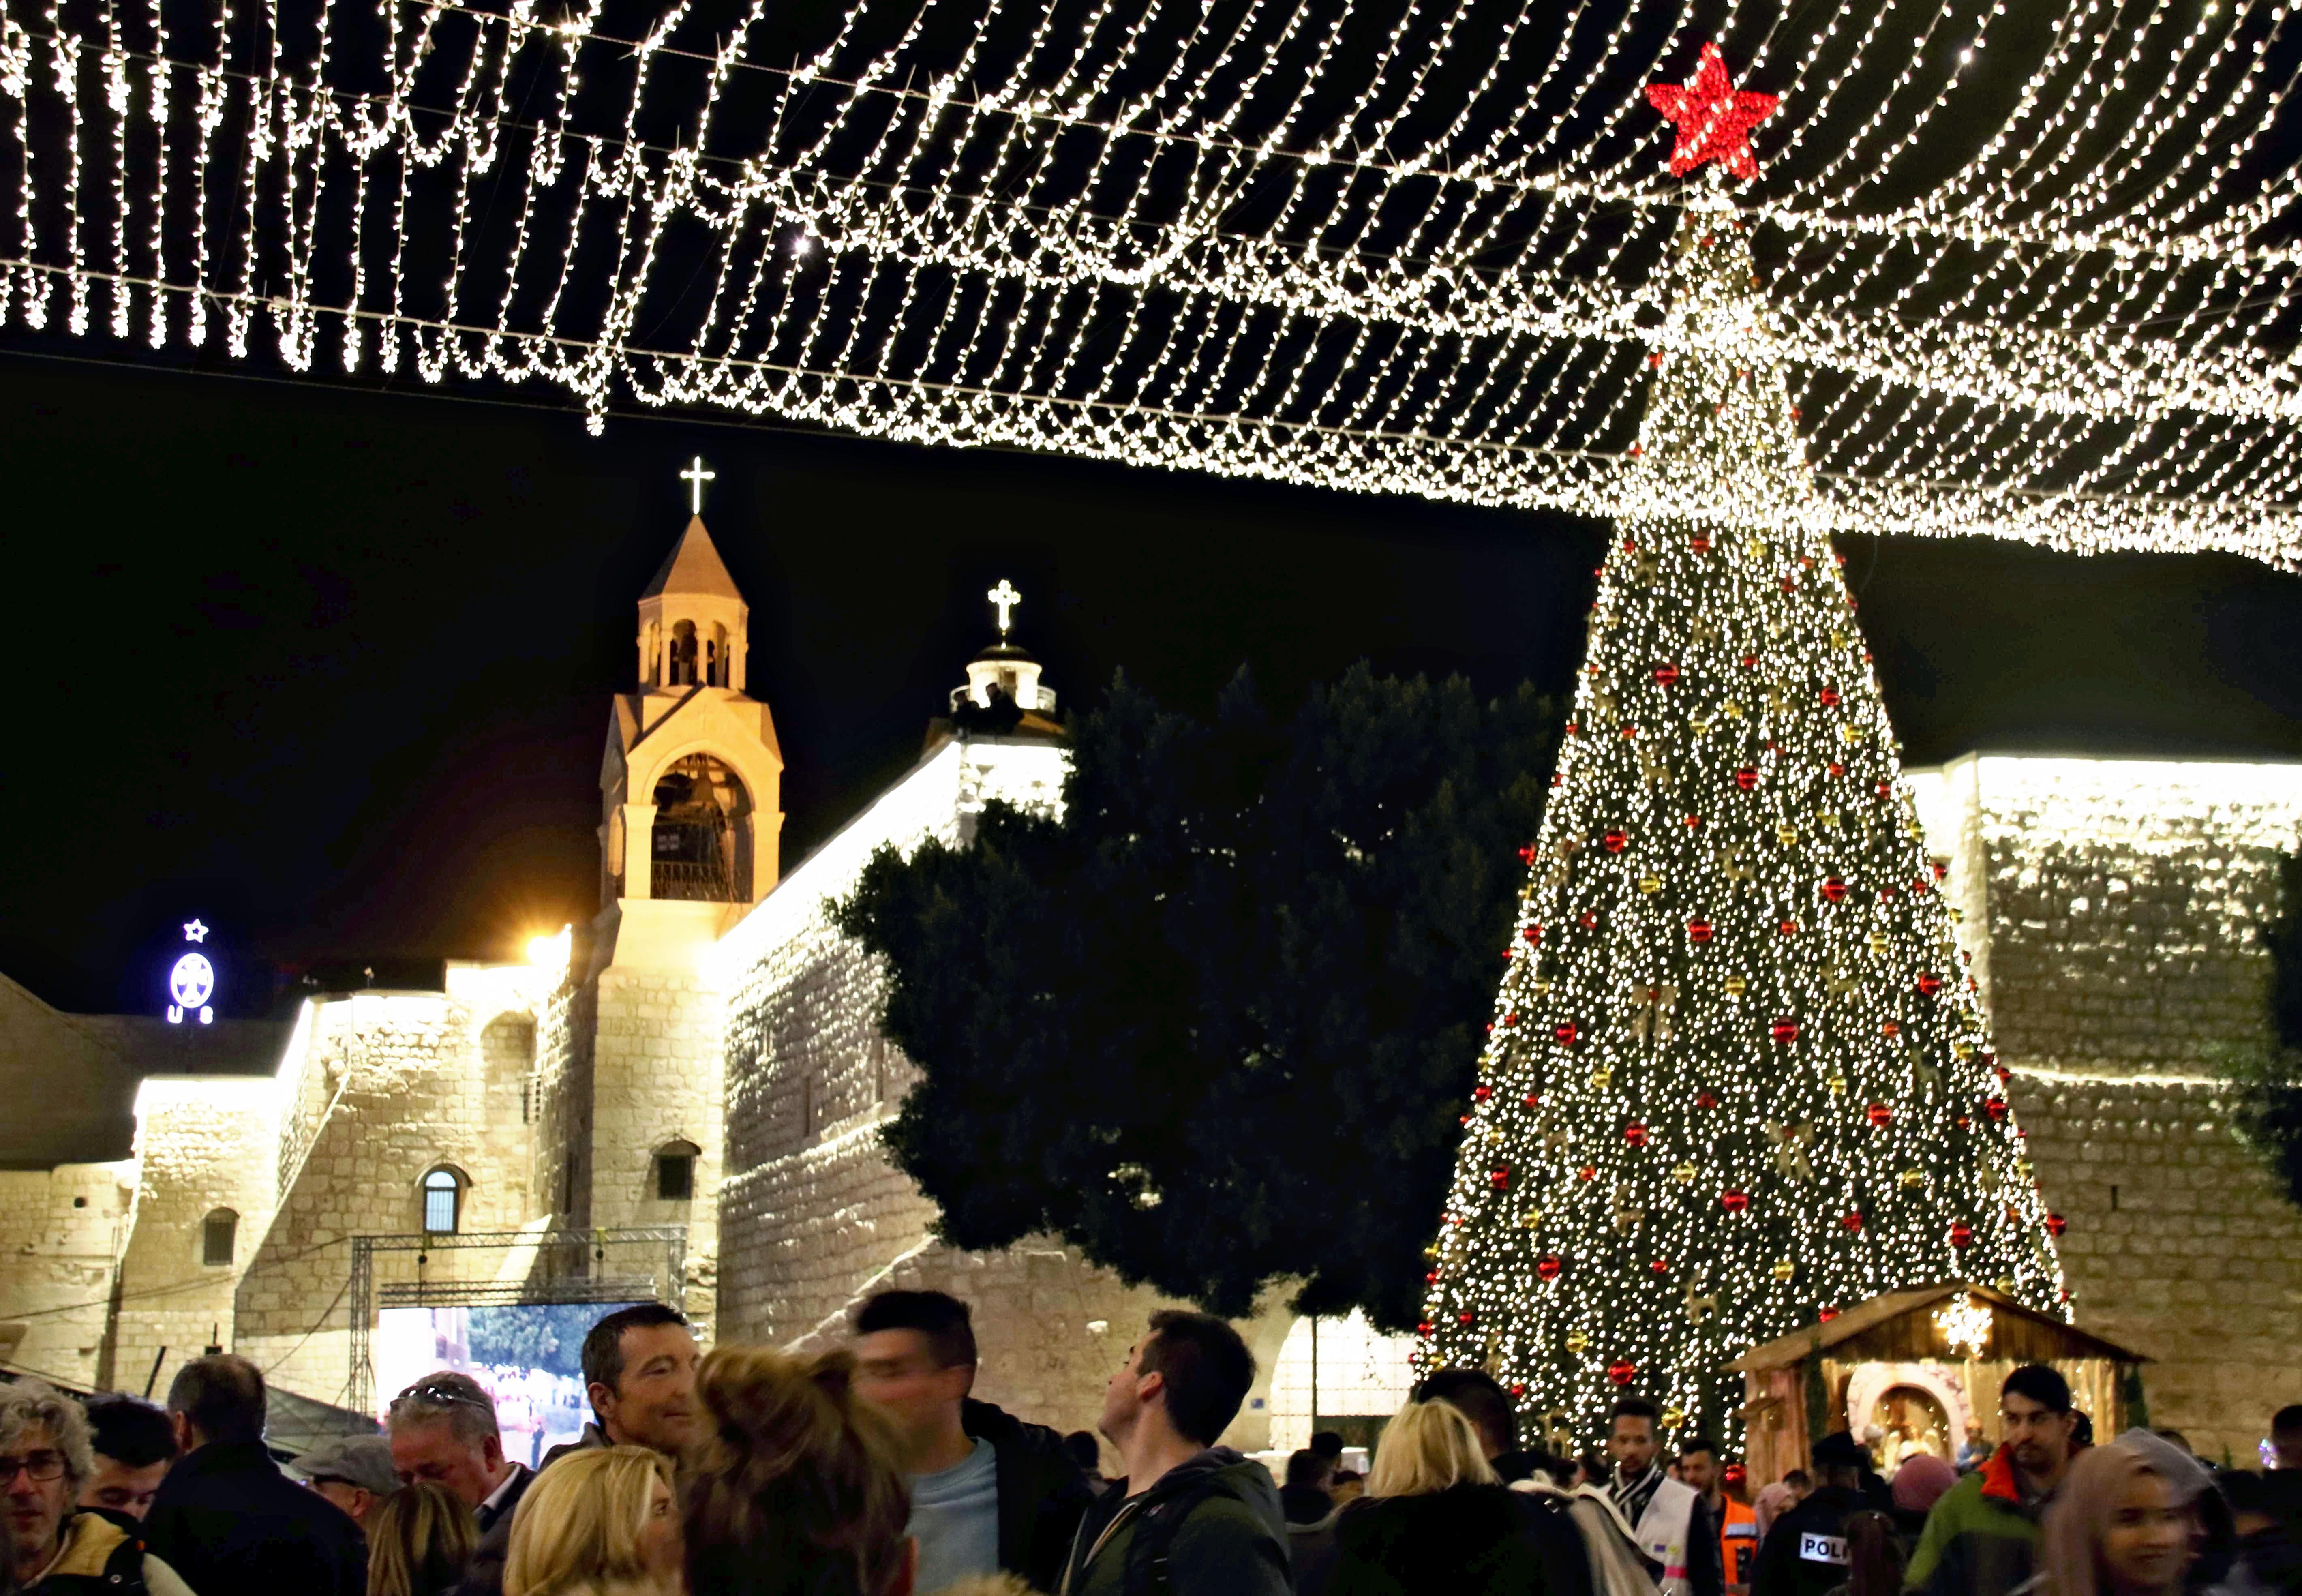 People celebrate Christmas in front of the Church of the Nativity, or Basilica of the Nativity, in Bethlehem on Dec. 24, 2019.( The Yomiuri Shimbun via AP Images )